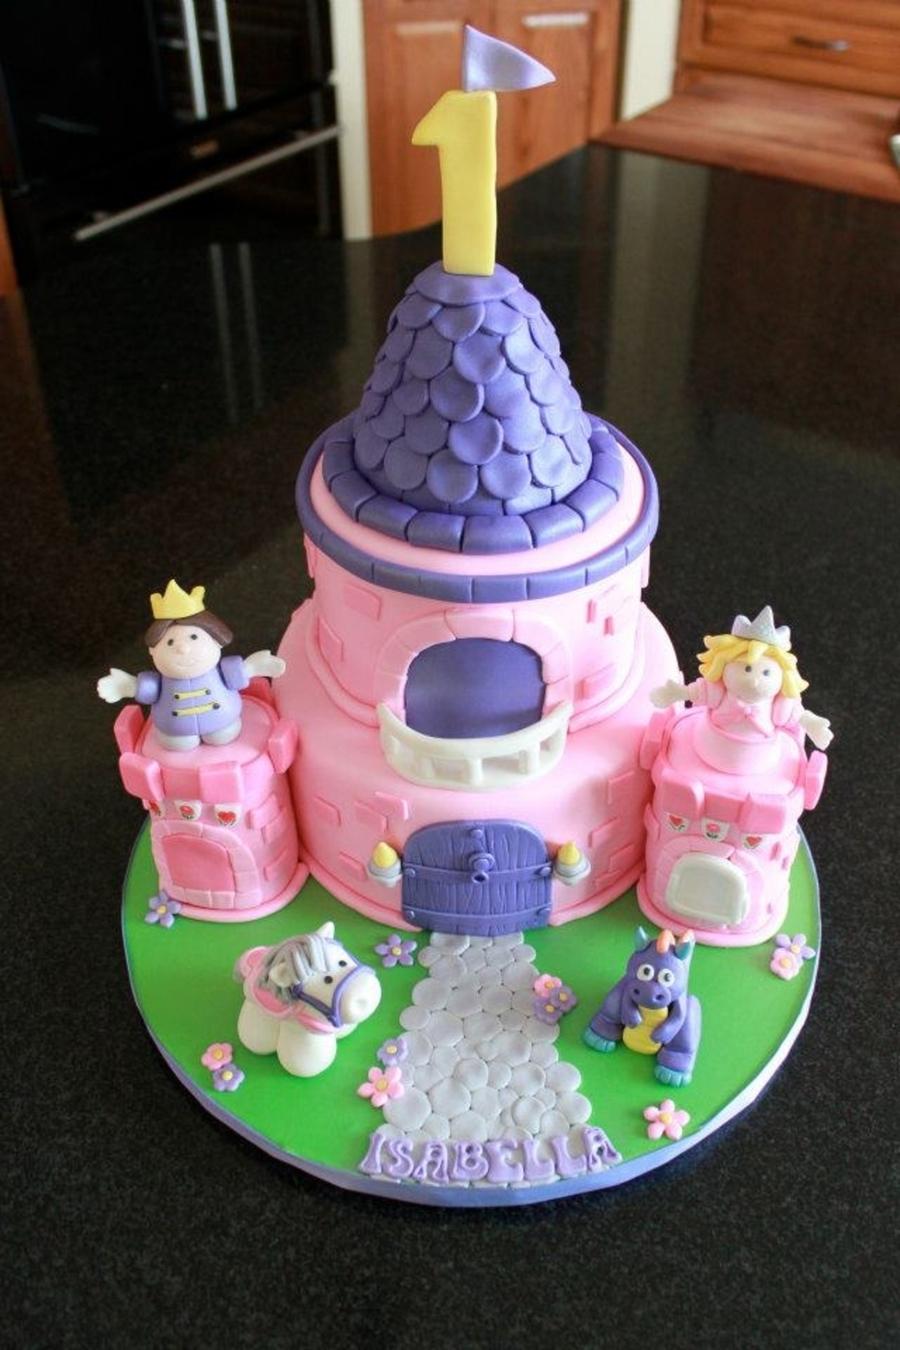 Astonishing Fisher Price Castle Cakecentral Com Personalised Birthday Cards Beptaeletsinfo